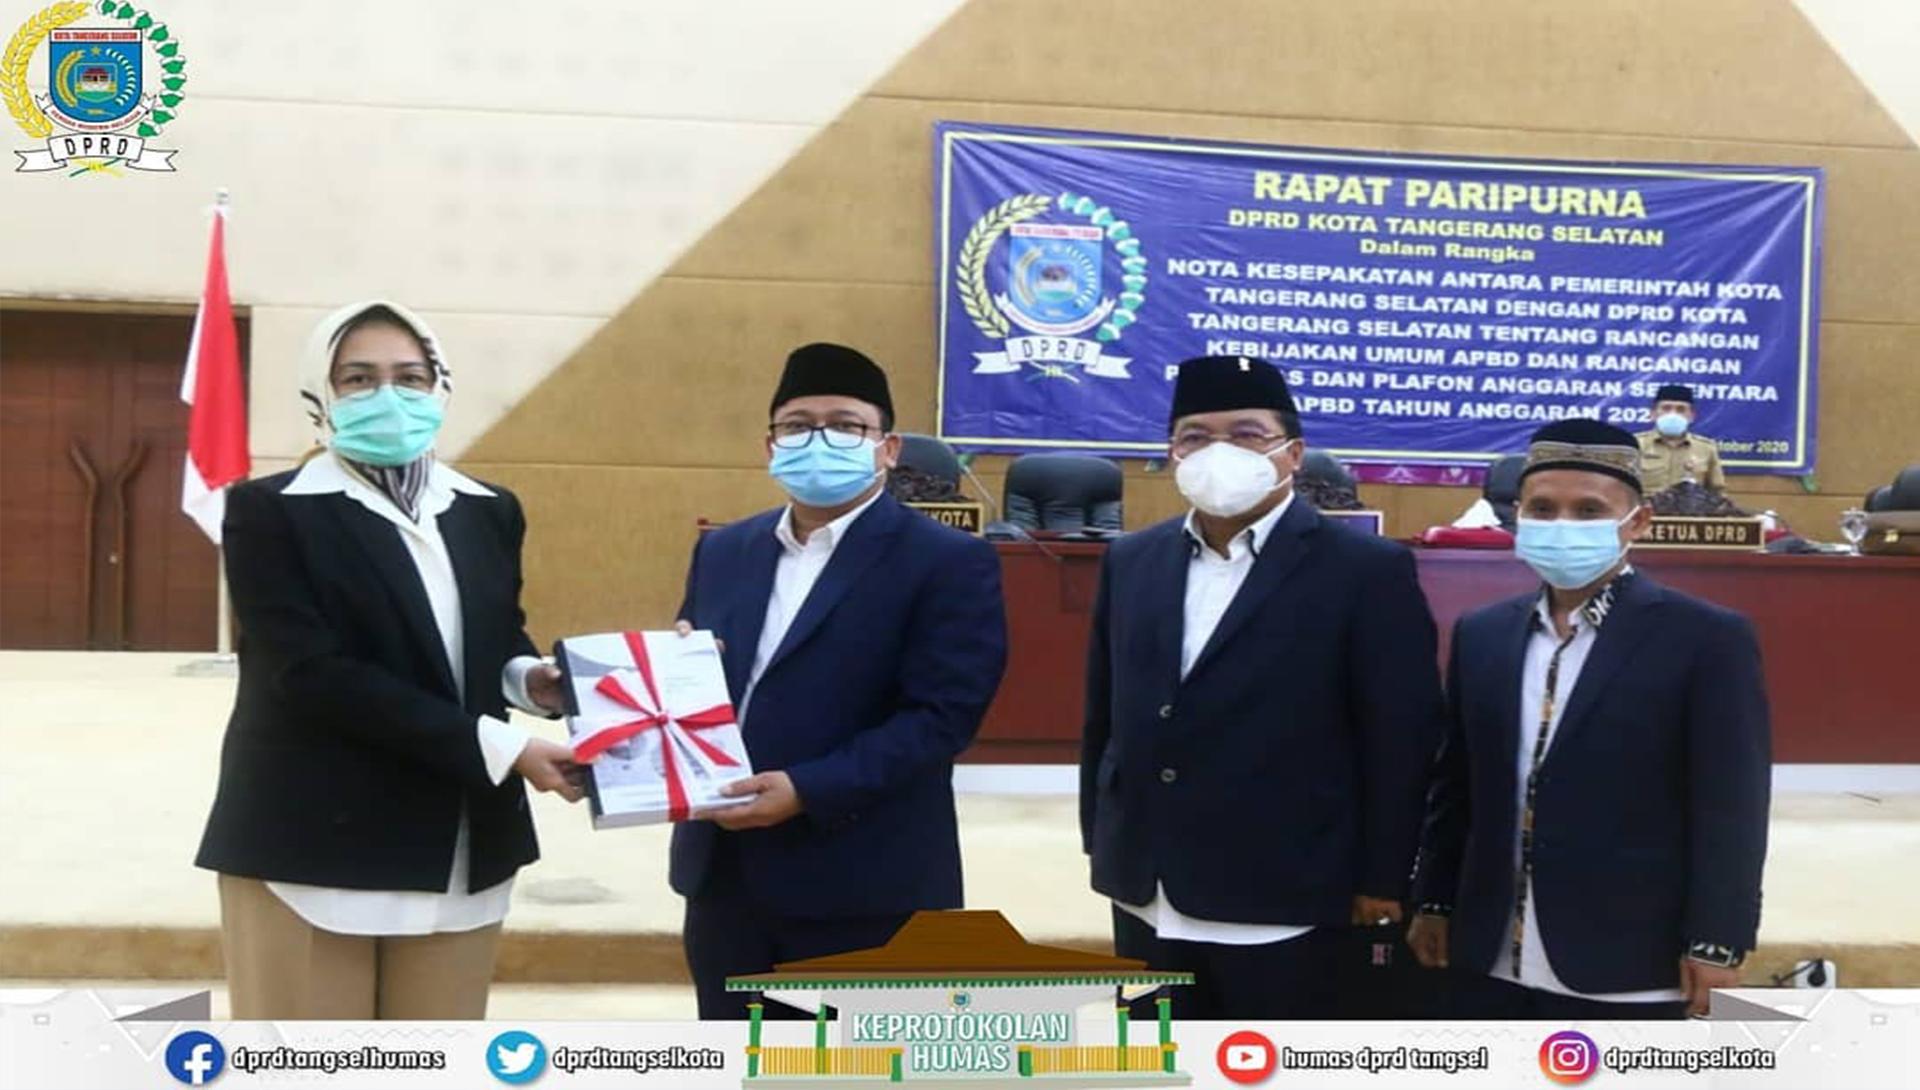 Rapat Paripurna Nota Kesepakatan antara Pemkot dengan DPRD